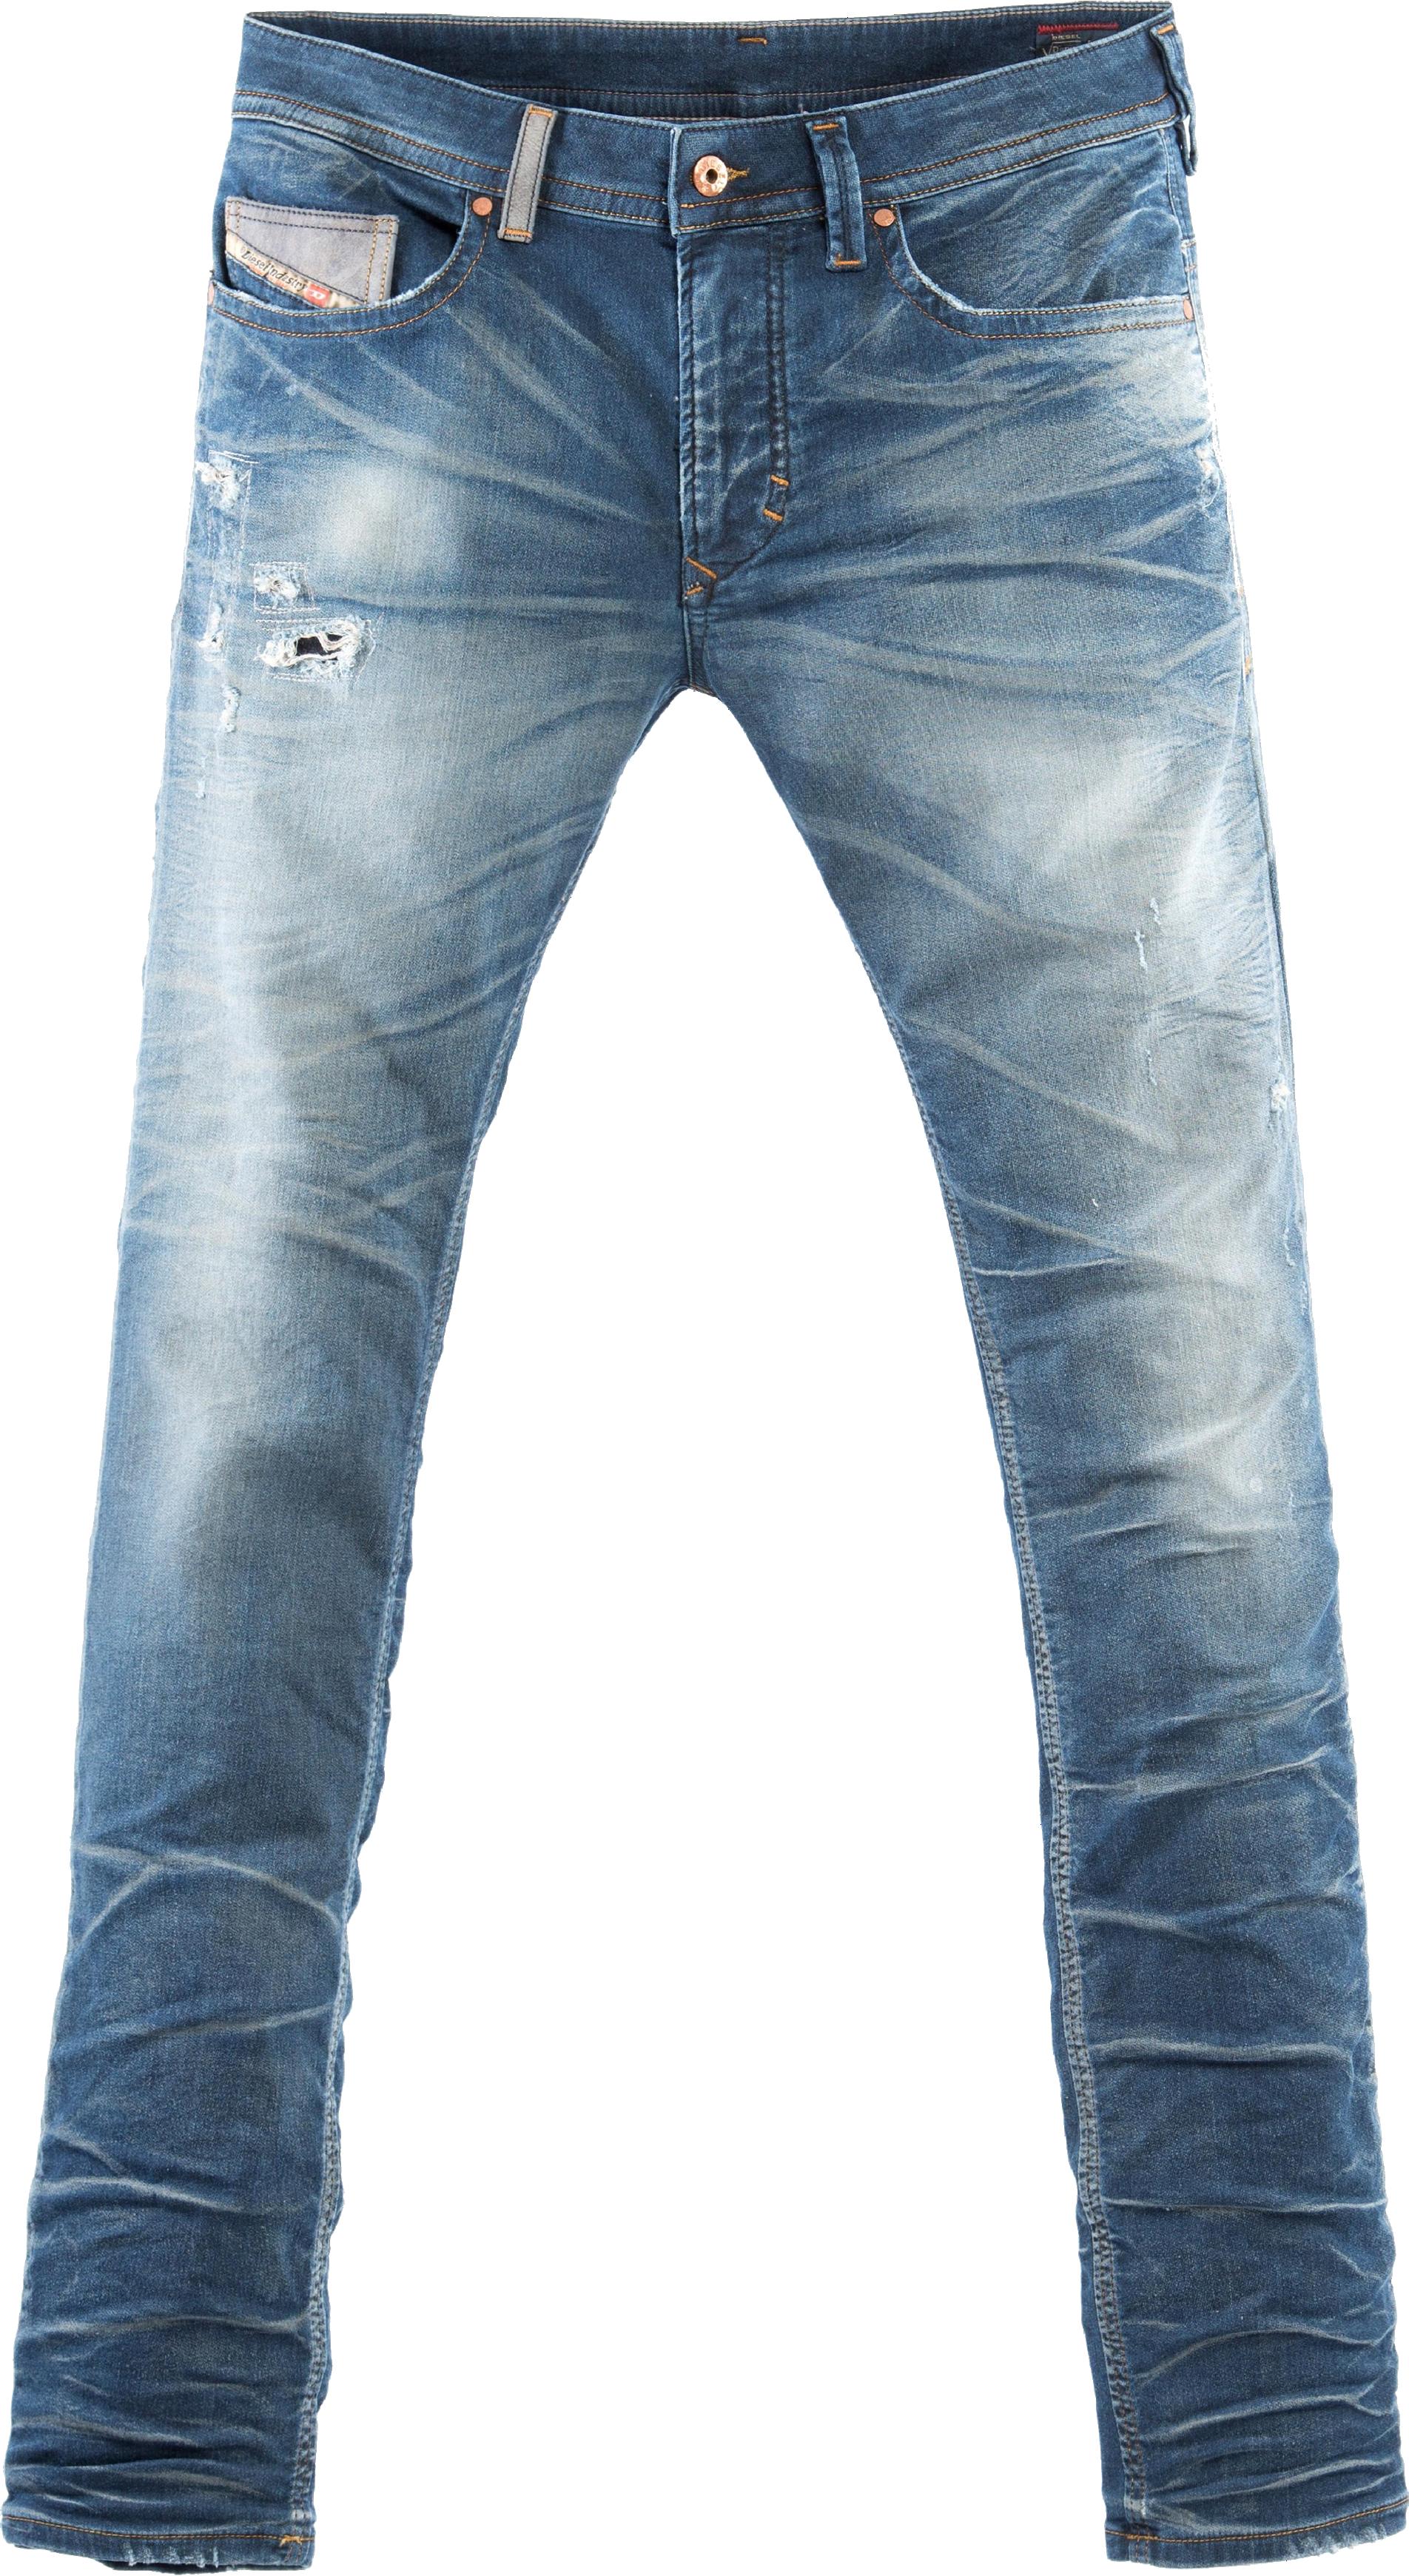 Men's  Jeans PNG Image